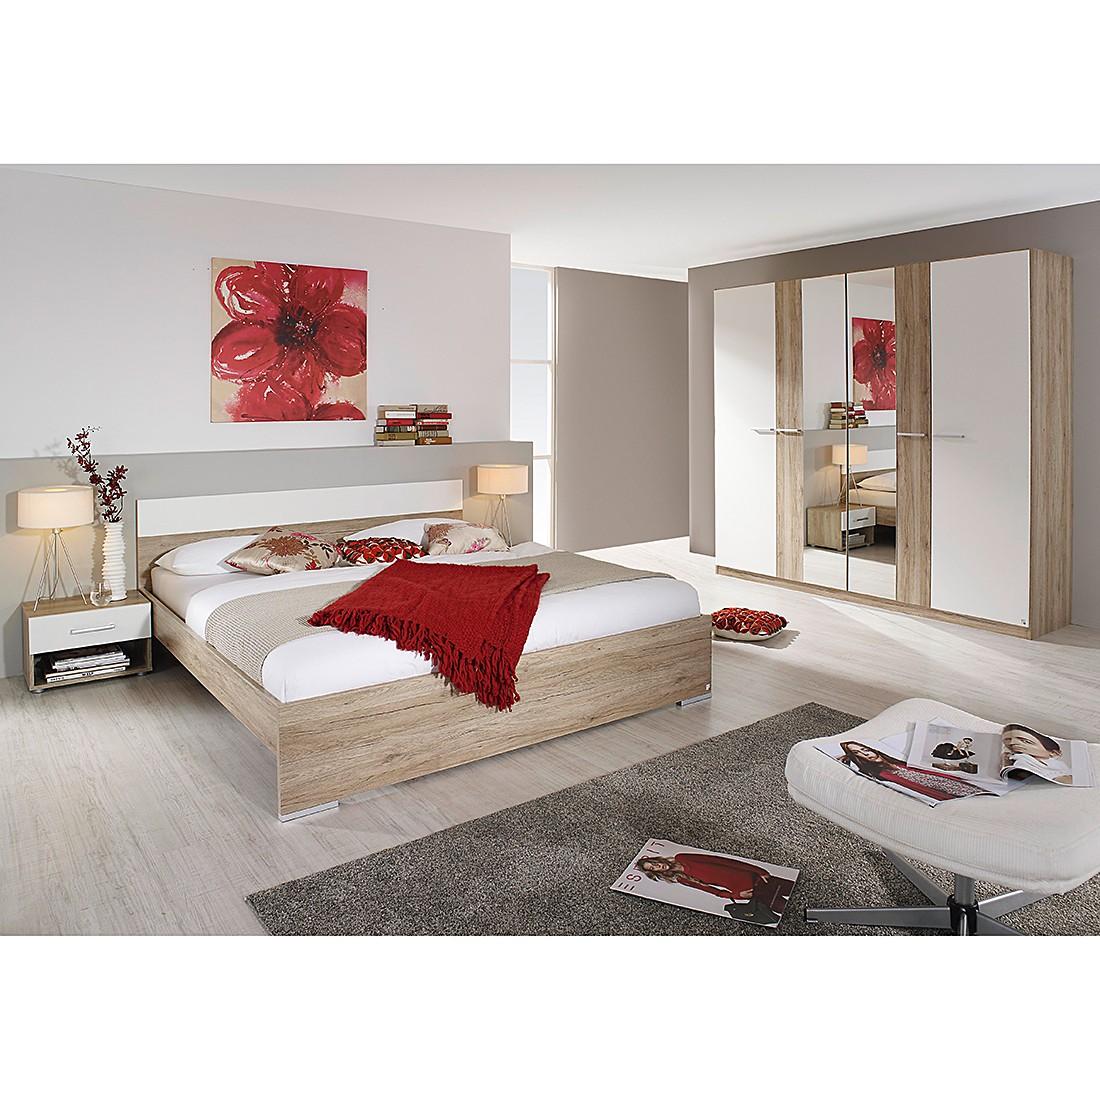 Ensemble pour chambre à coucher Badalona (4 éléments) - Imitation chêne / Blanc alpin - 160 cm x 200